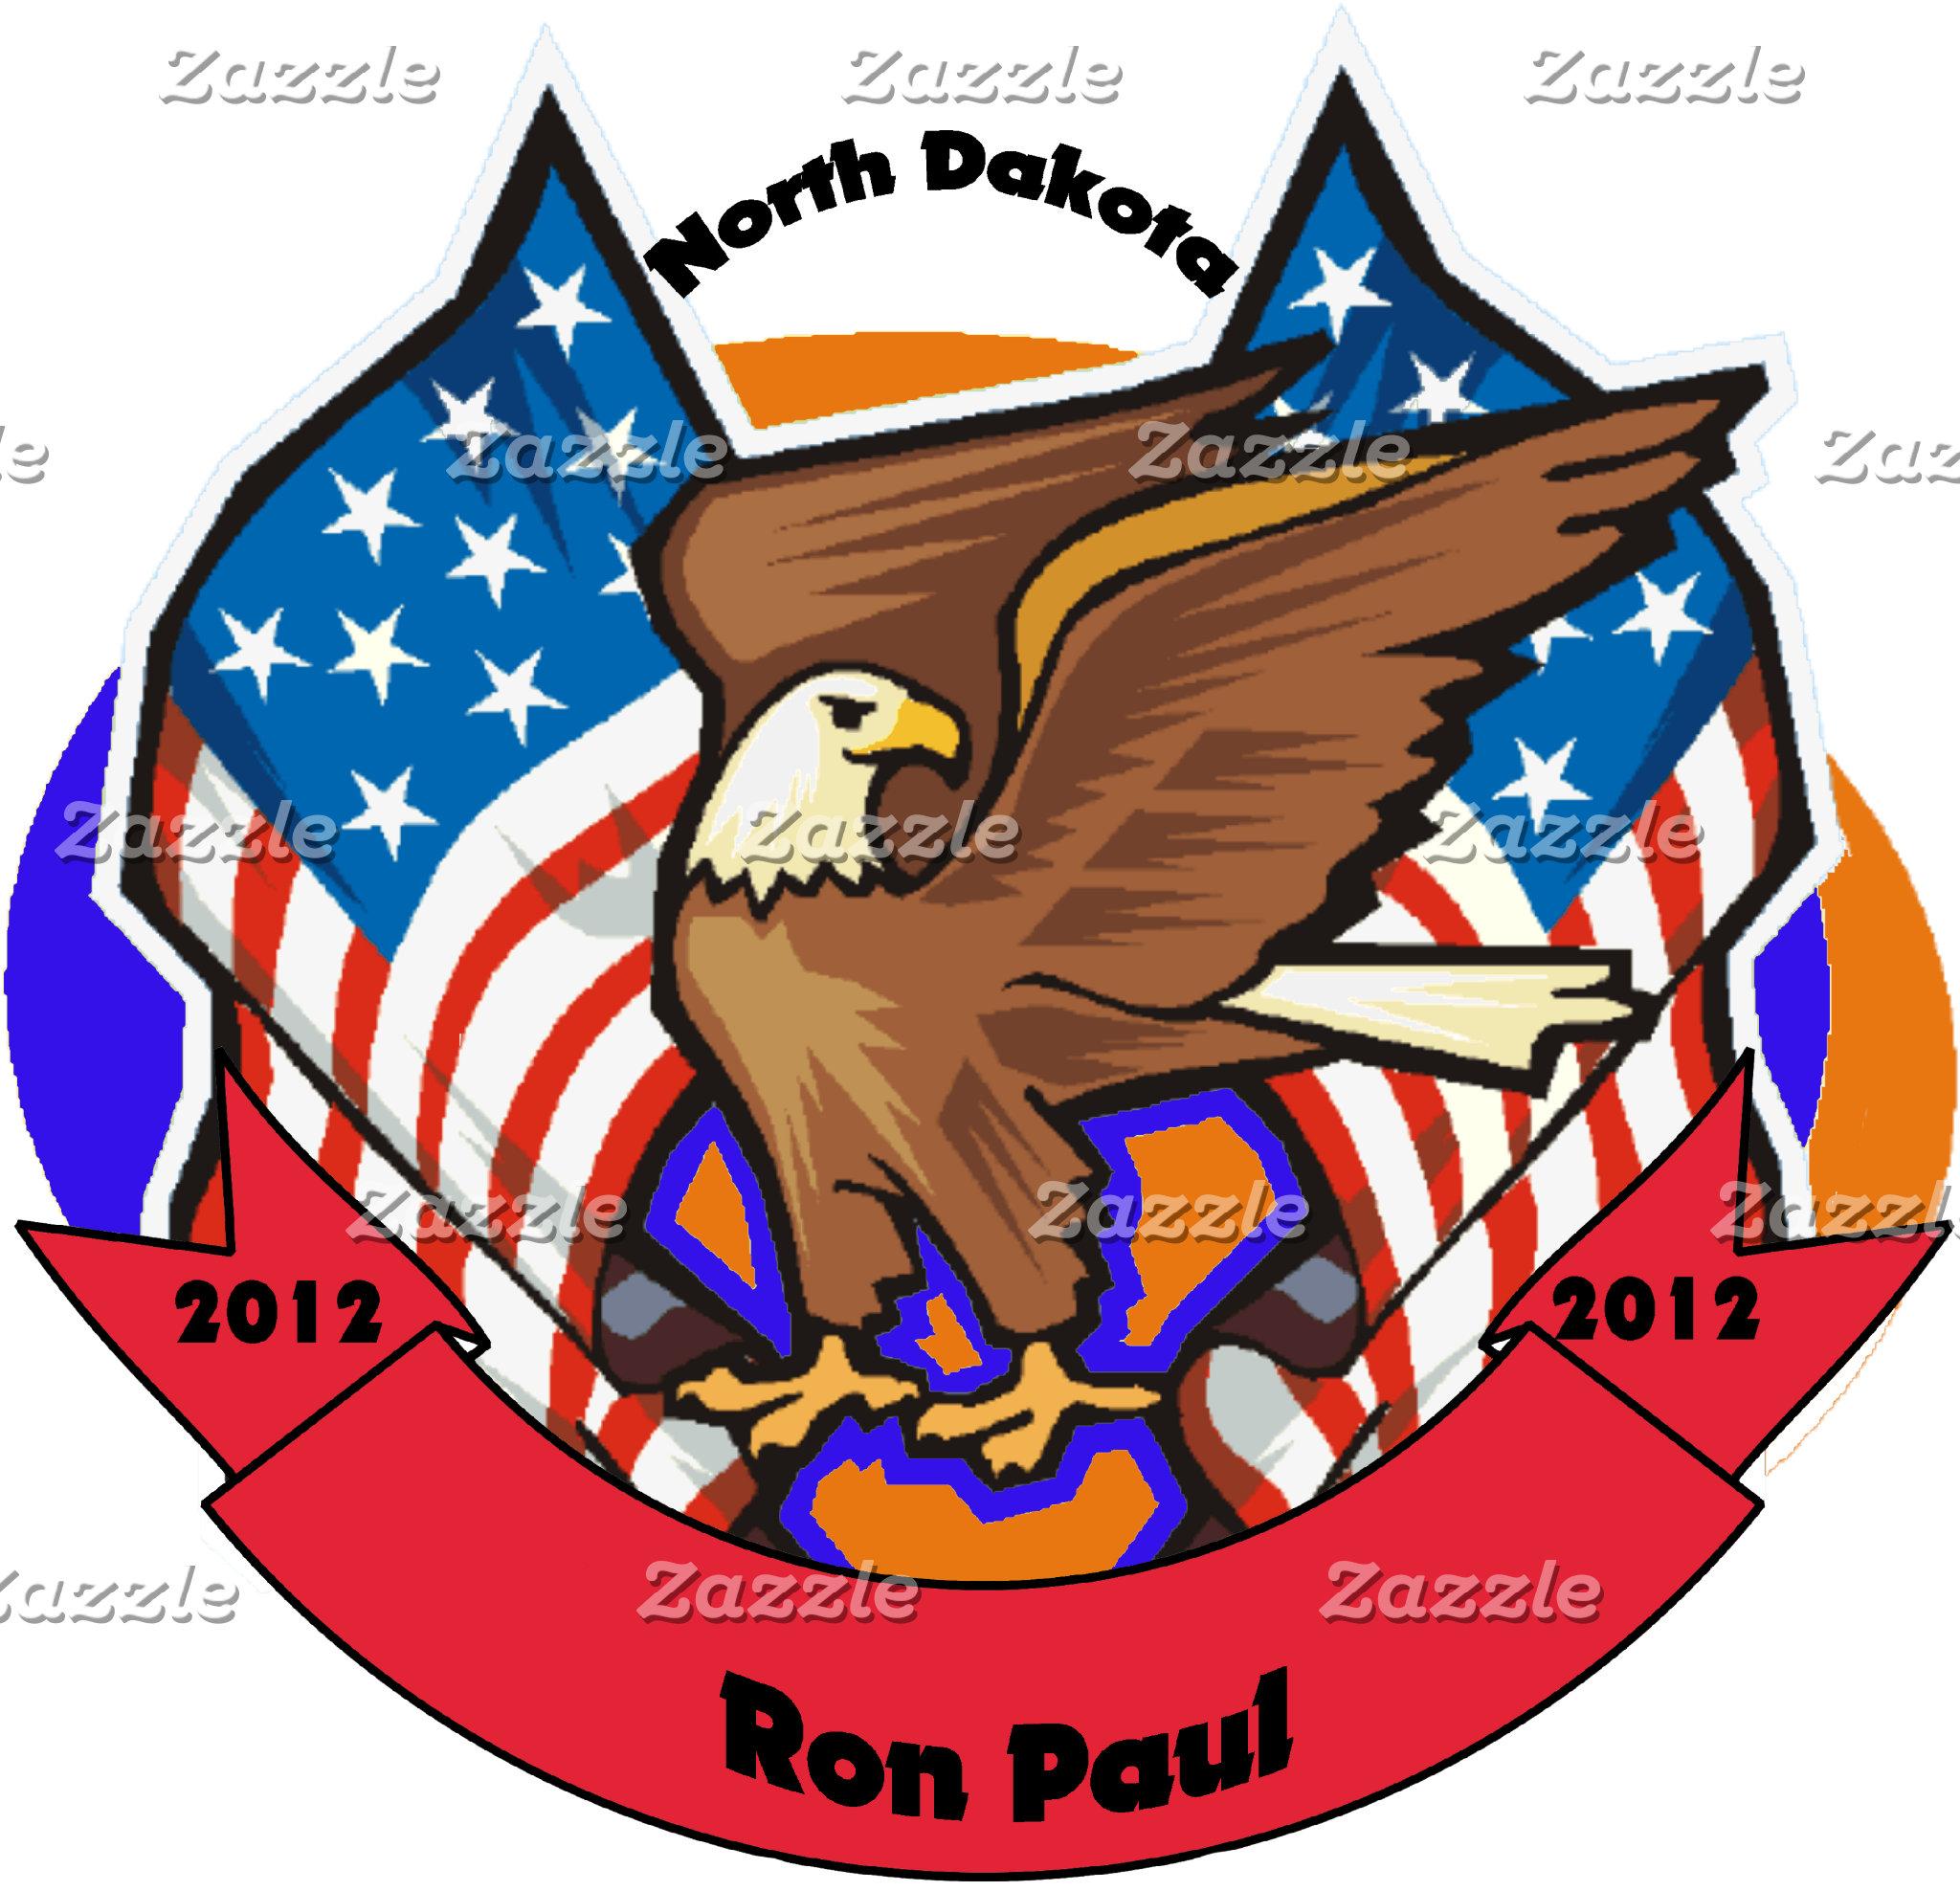 North Carolina for Ron Paul